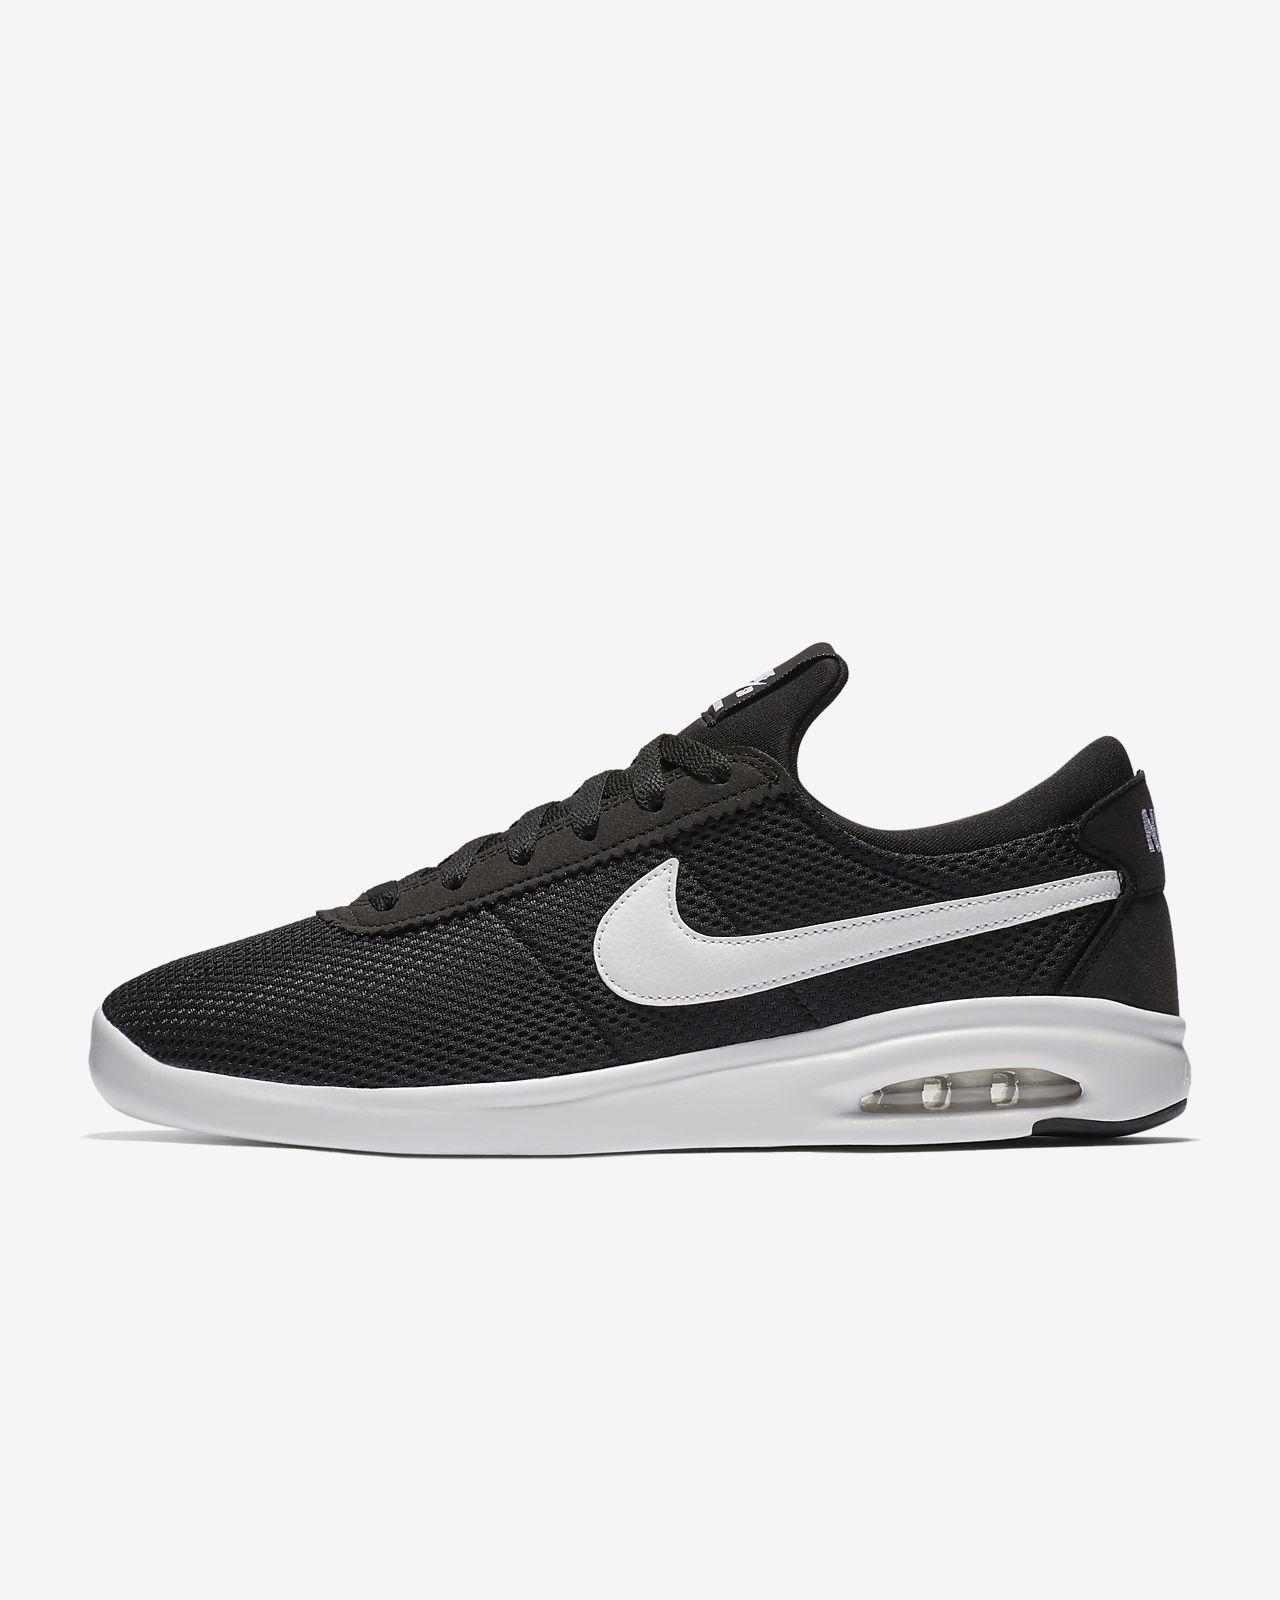 sale retailer d0124 15c05 ... Scarpa da skate Nike SB Air Max Bruin Vapor - Uomo